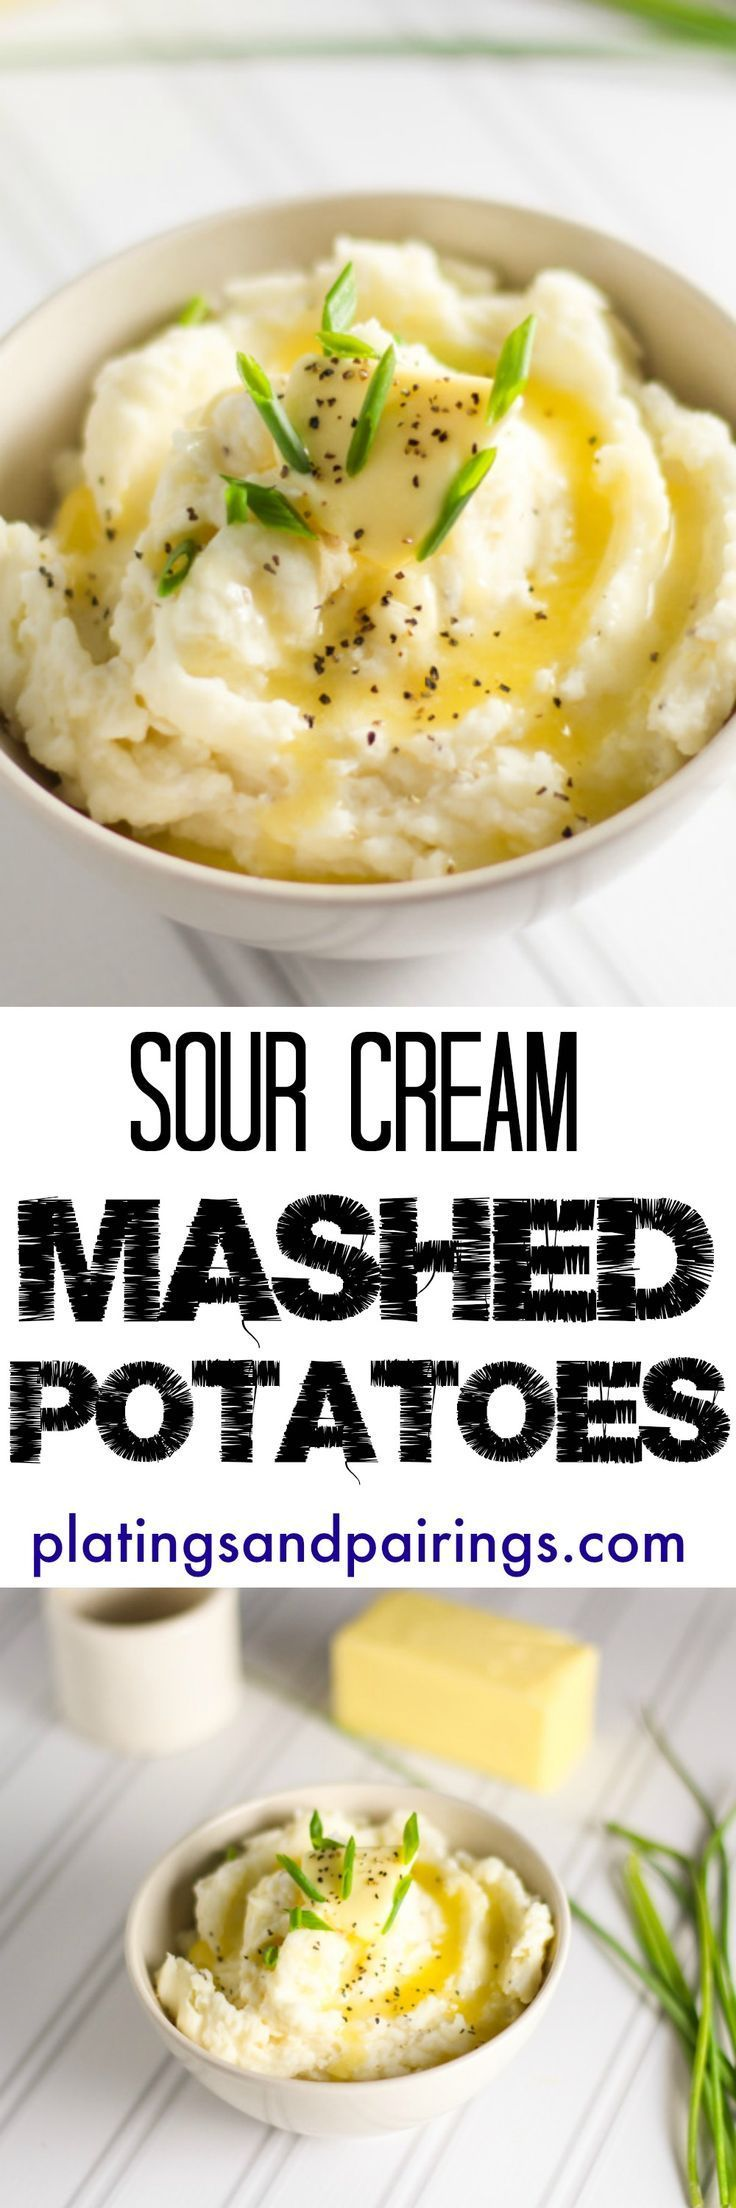 ... Potato Dishes on Pinterest   Crock pot, Crock pot cheesy potatoes and